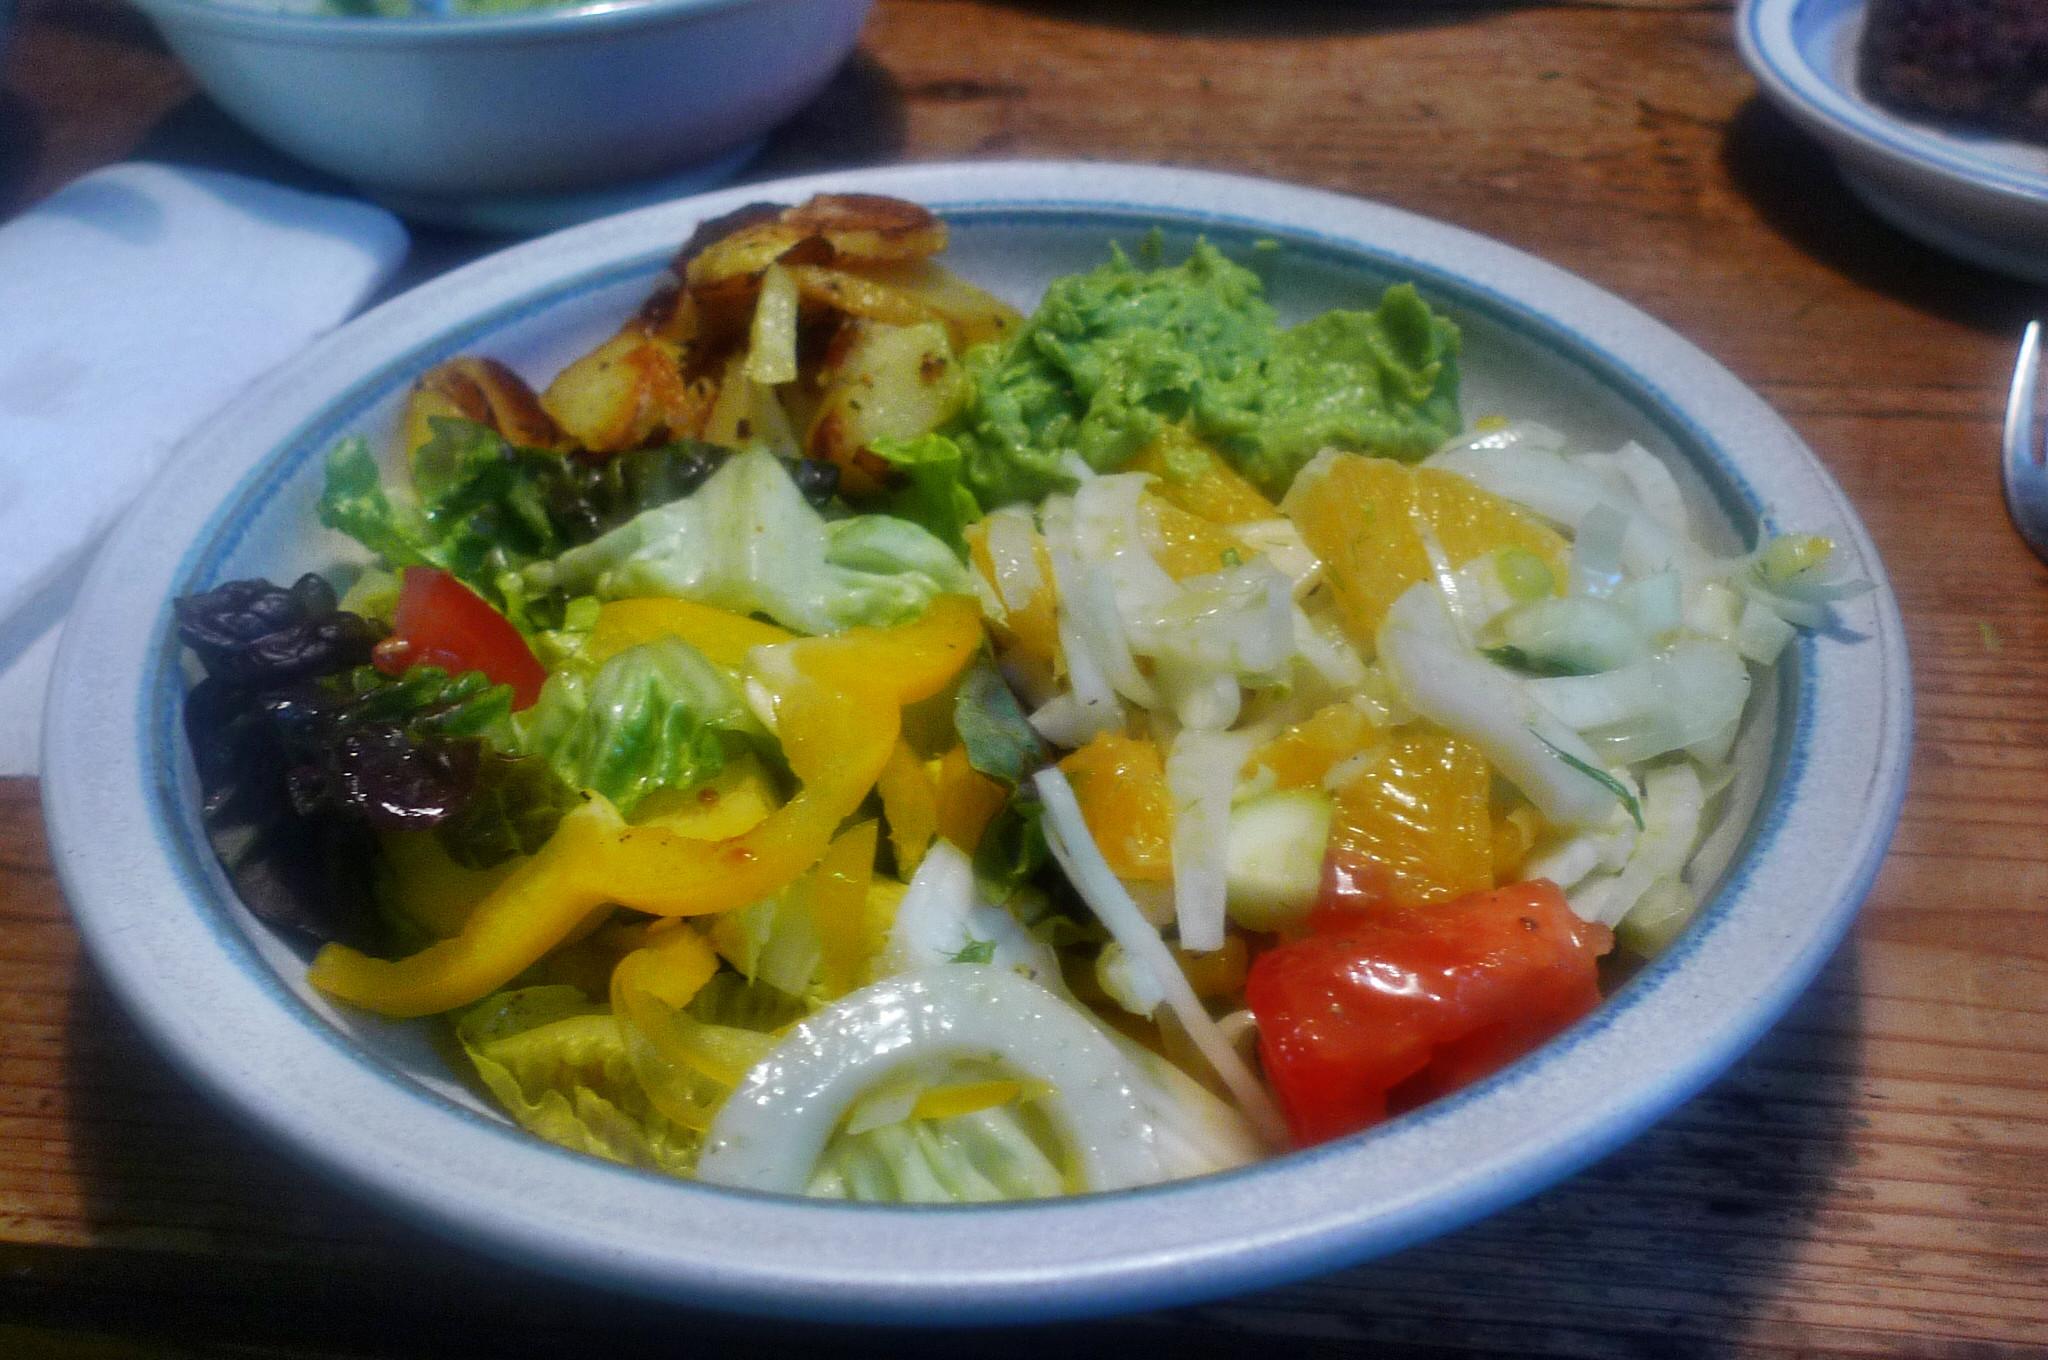 Guacamole,Fenchelsalat,Salat,Bratkartoffel--22.1.15   (13)